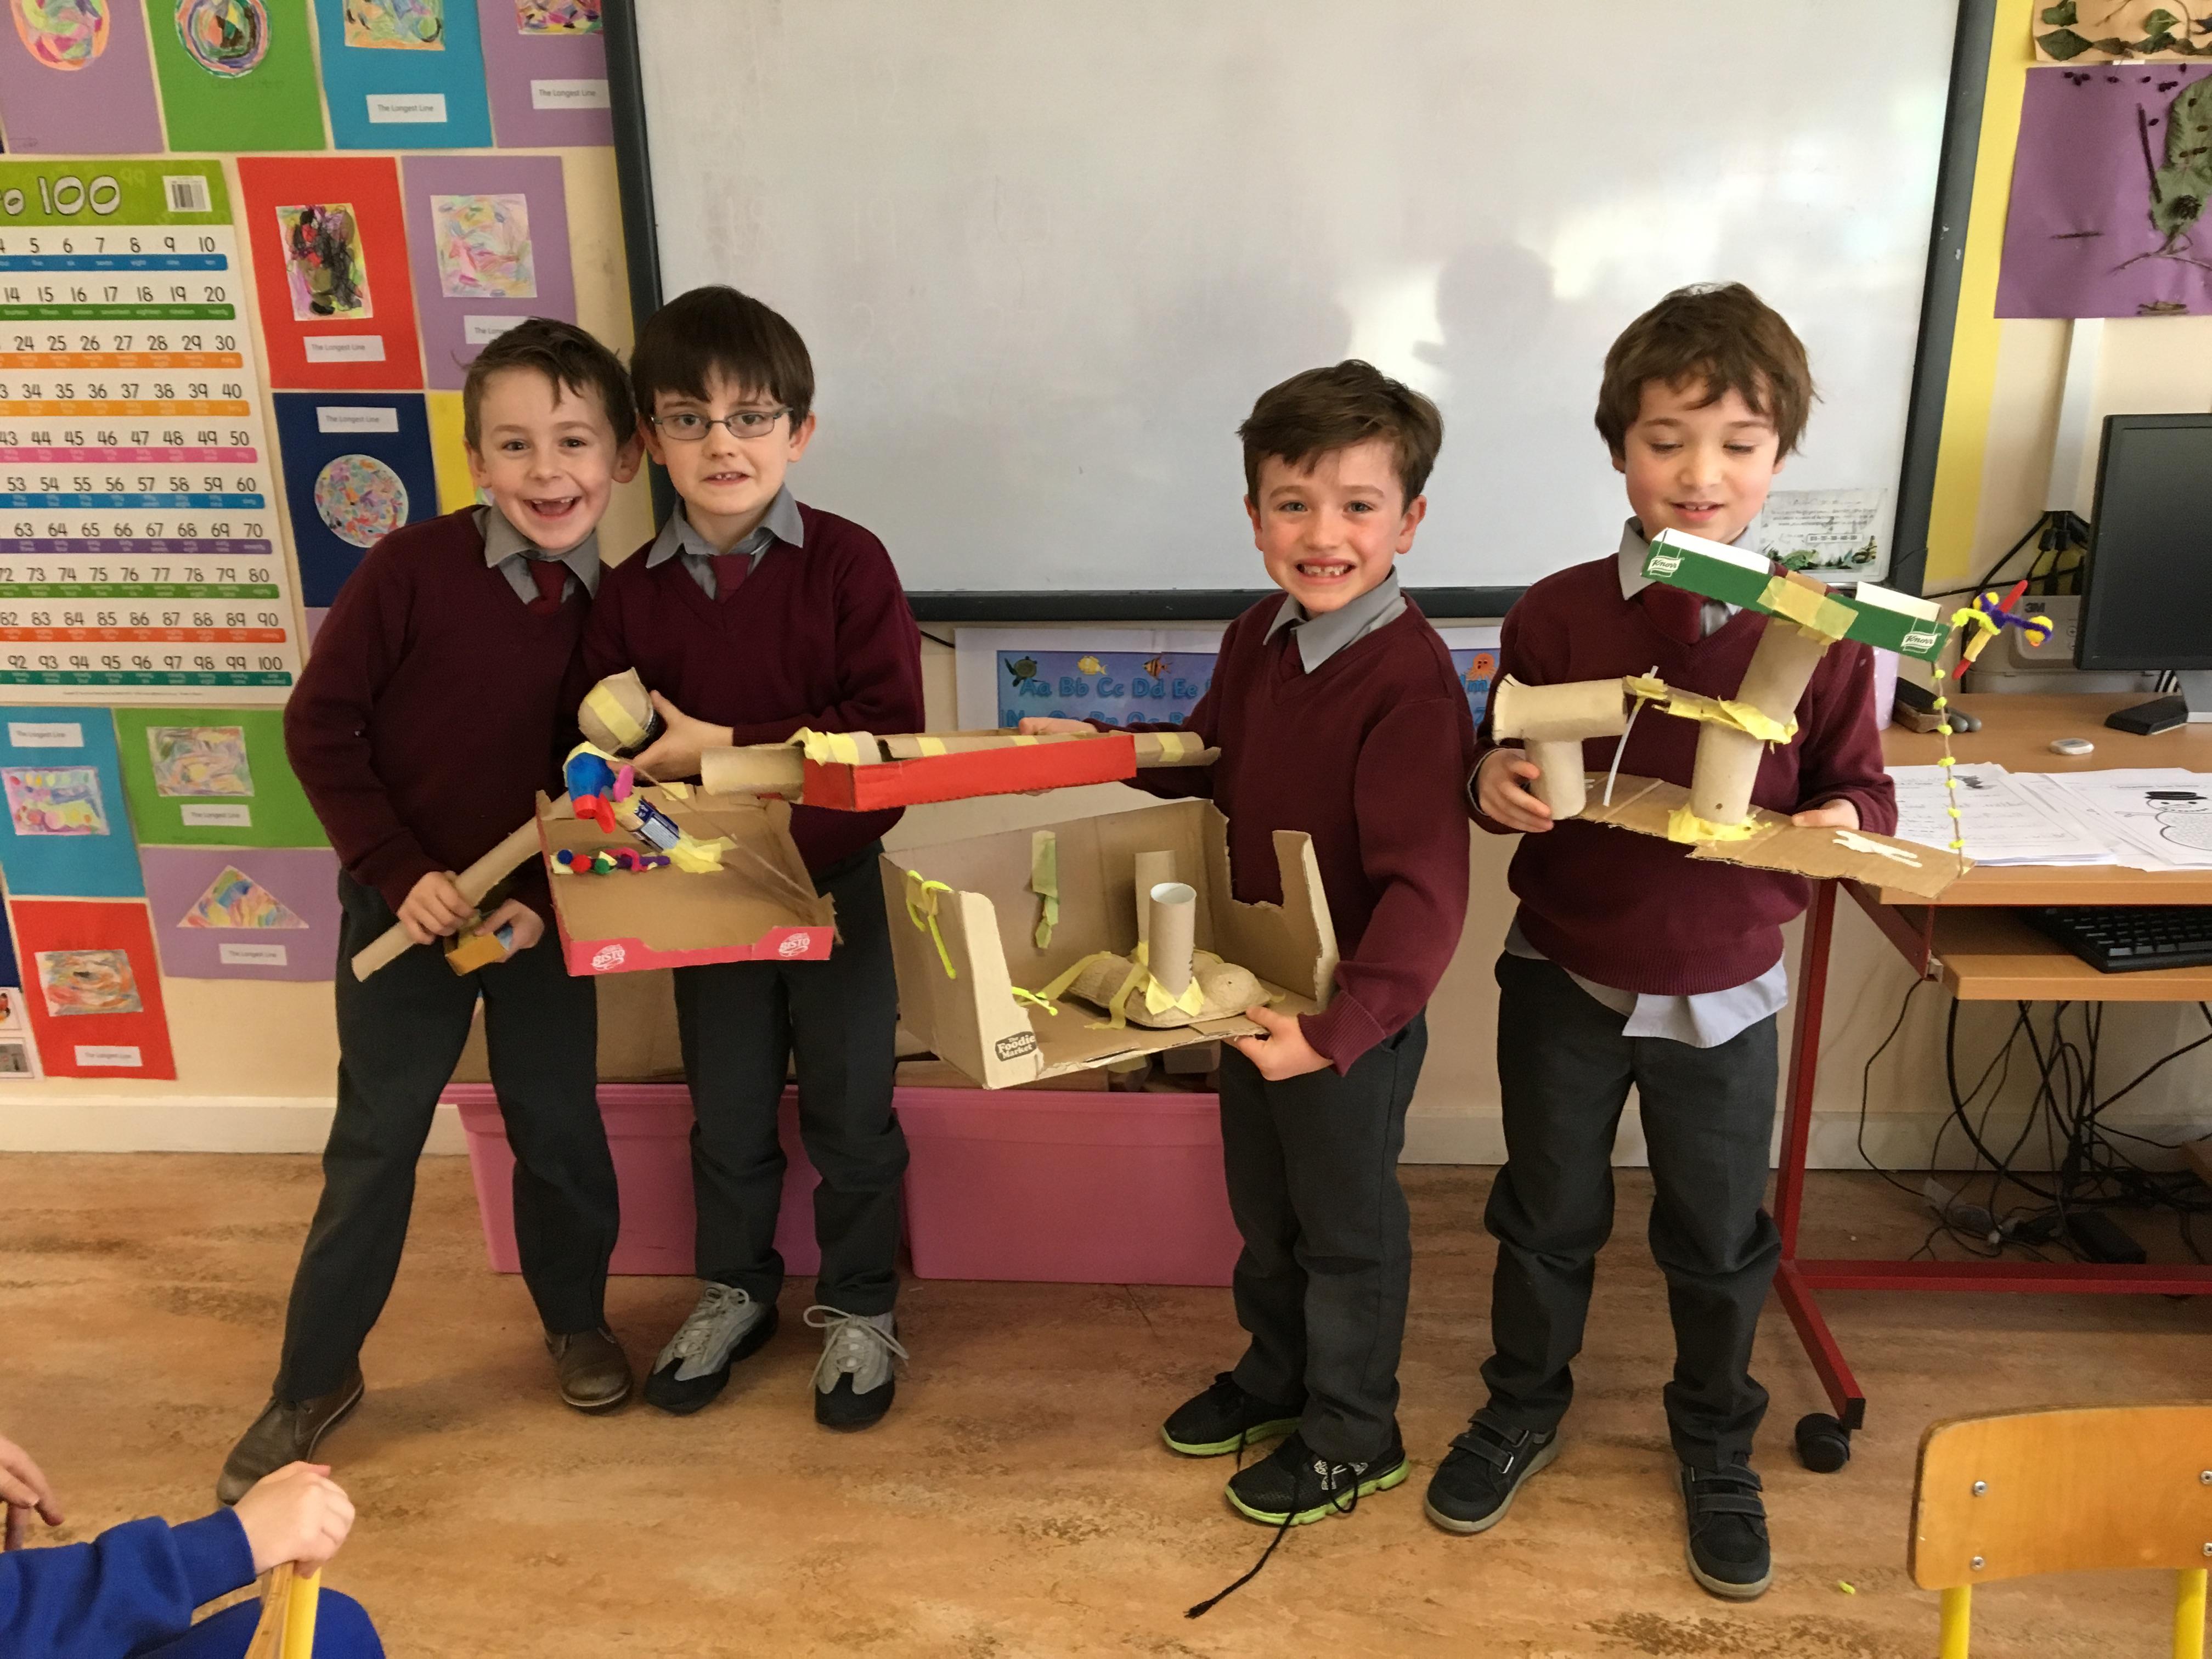 1st - Design & make playground -1